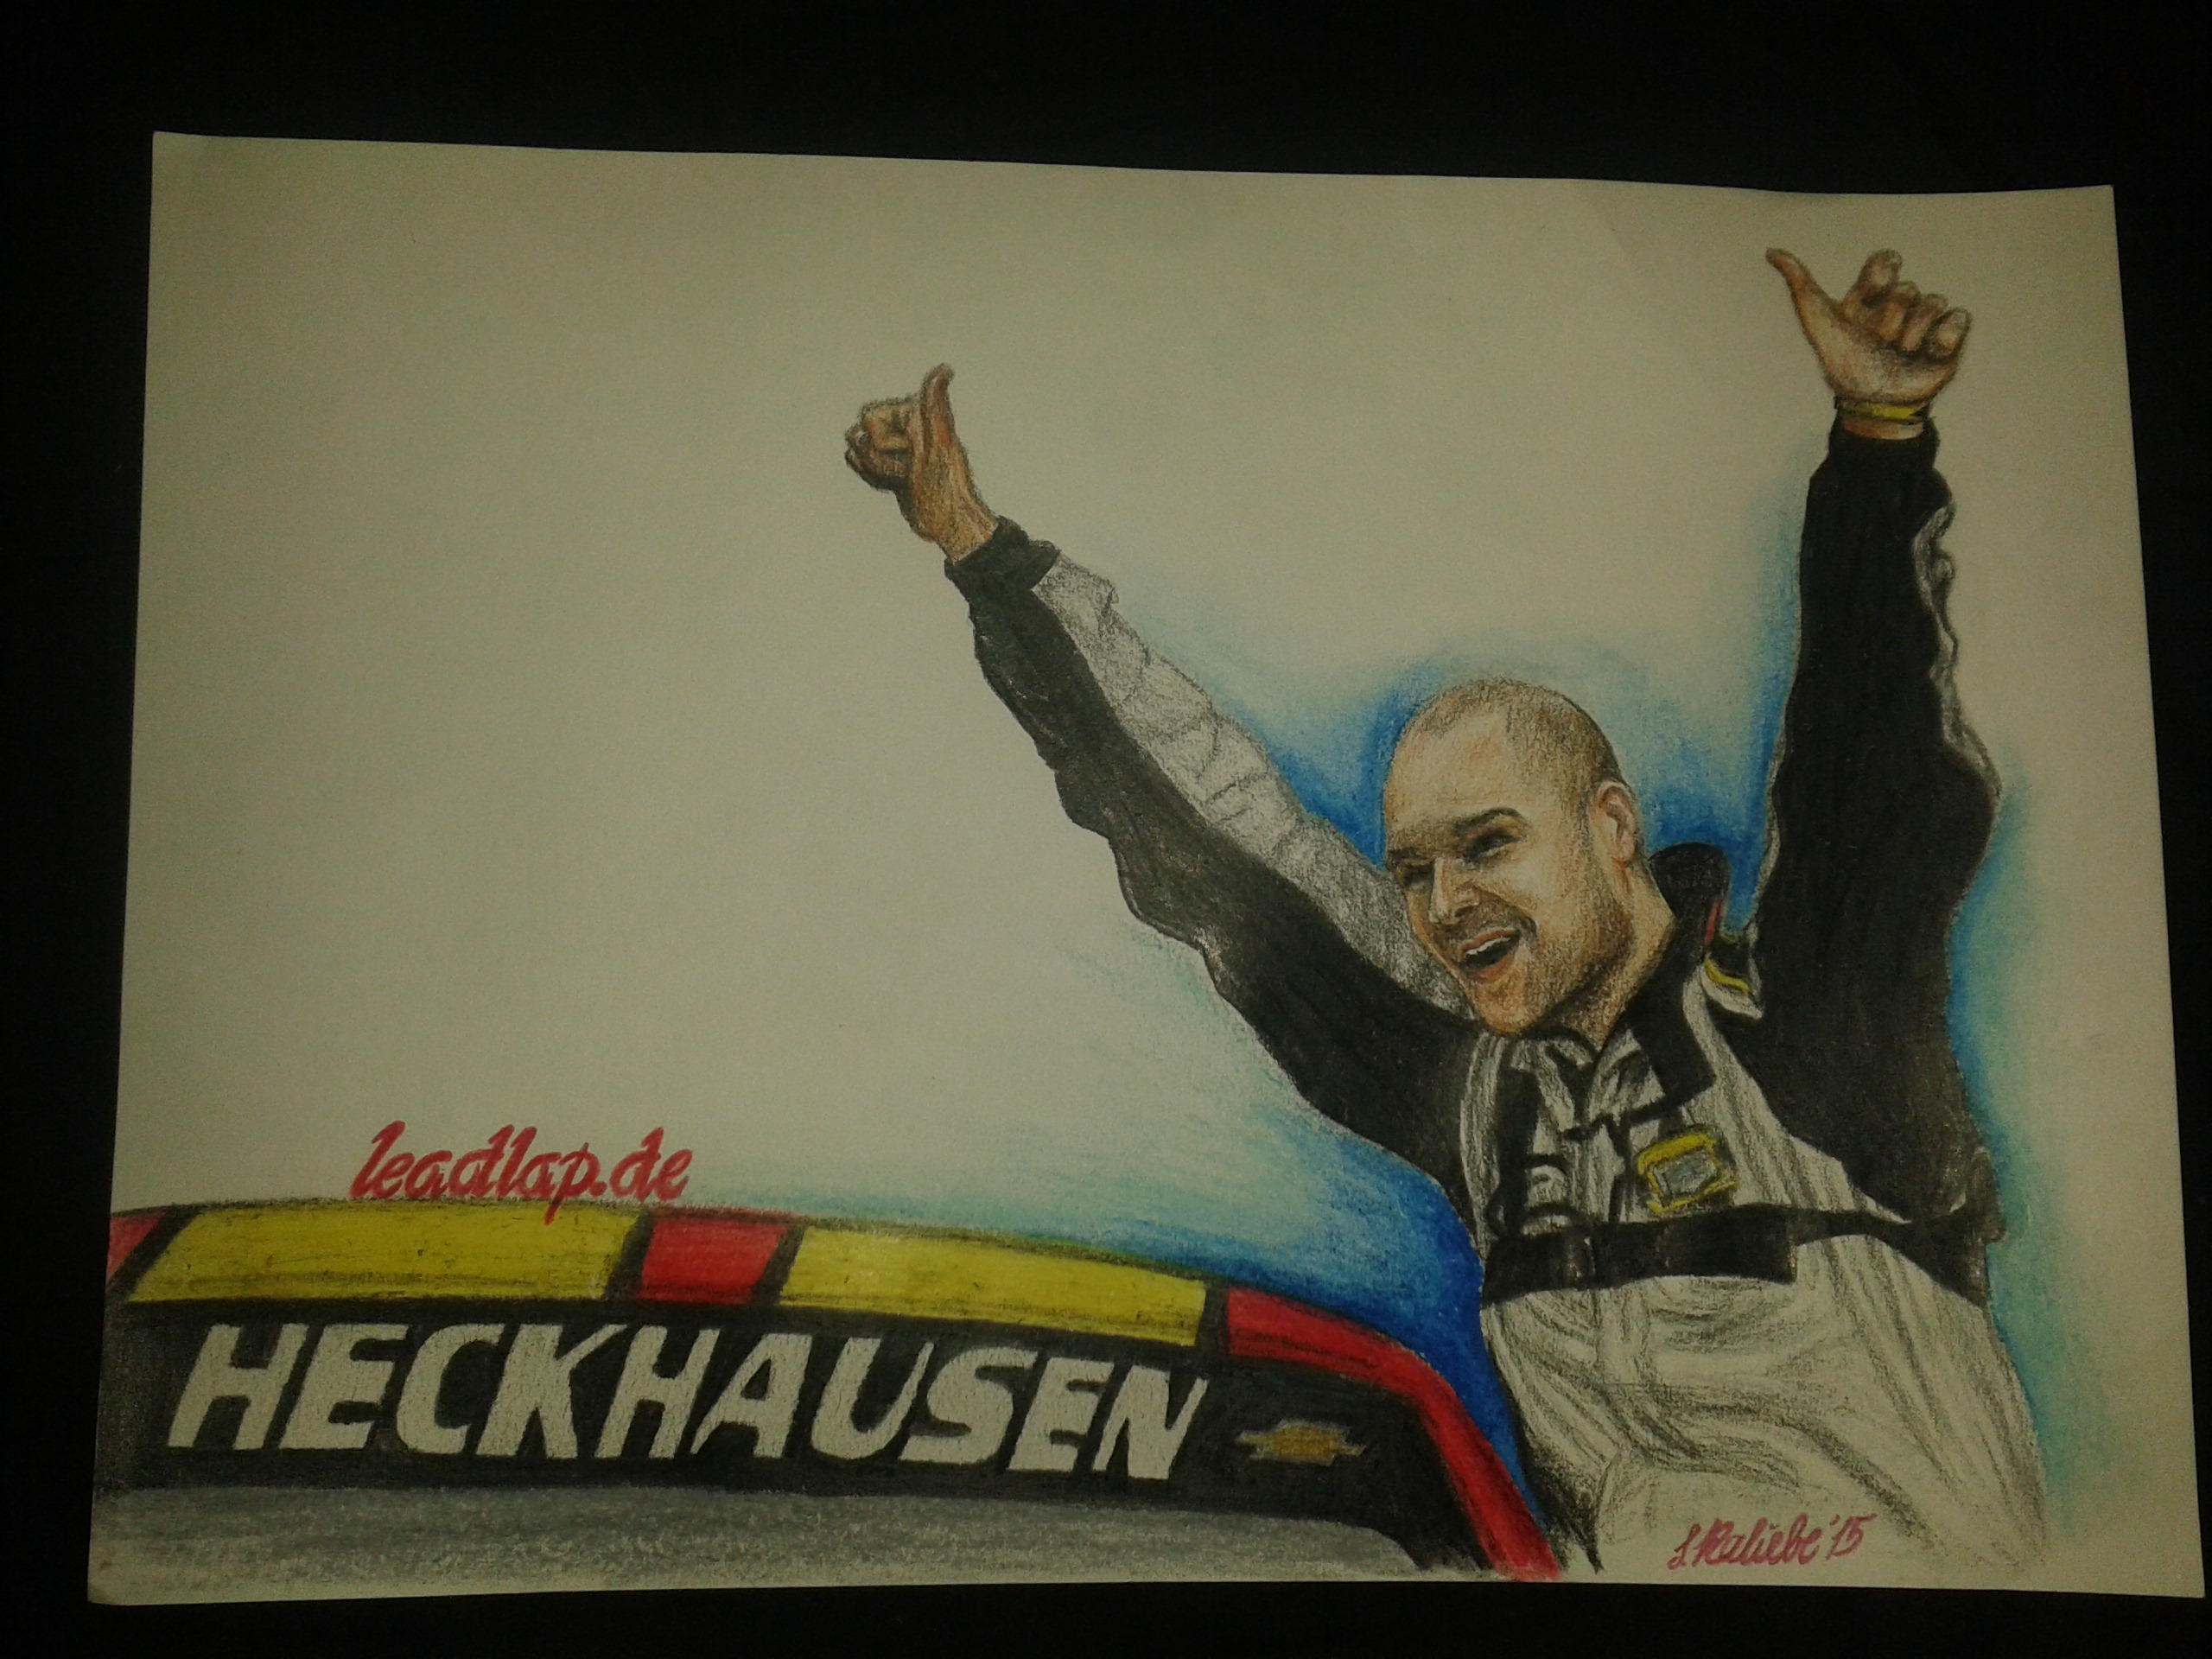 Patrick Heckhausens erster Sieg als Kunstwerk © Sarah Kaliebe (leadlap.de)